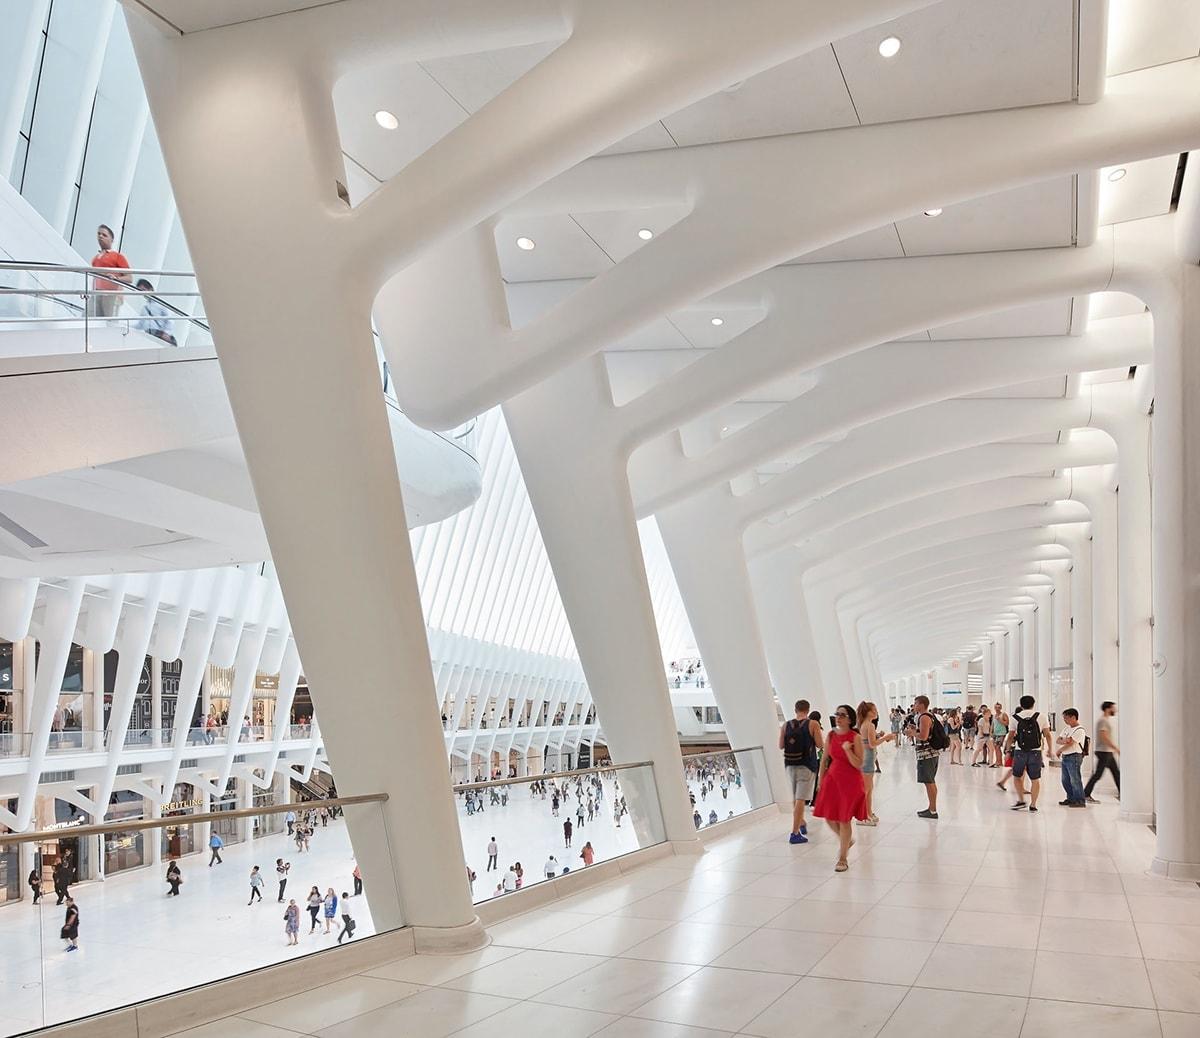 The World Trade Centre Transportation Hub